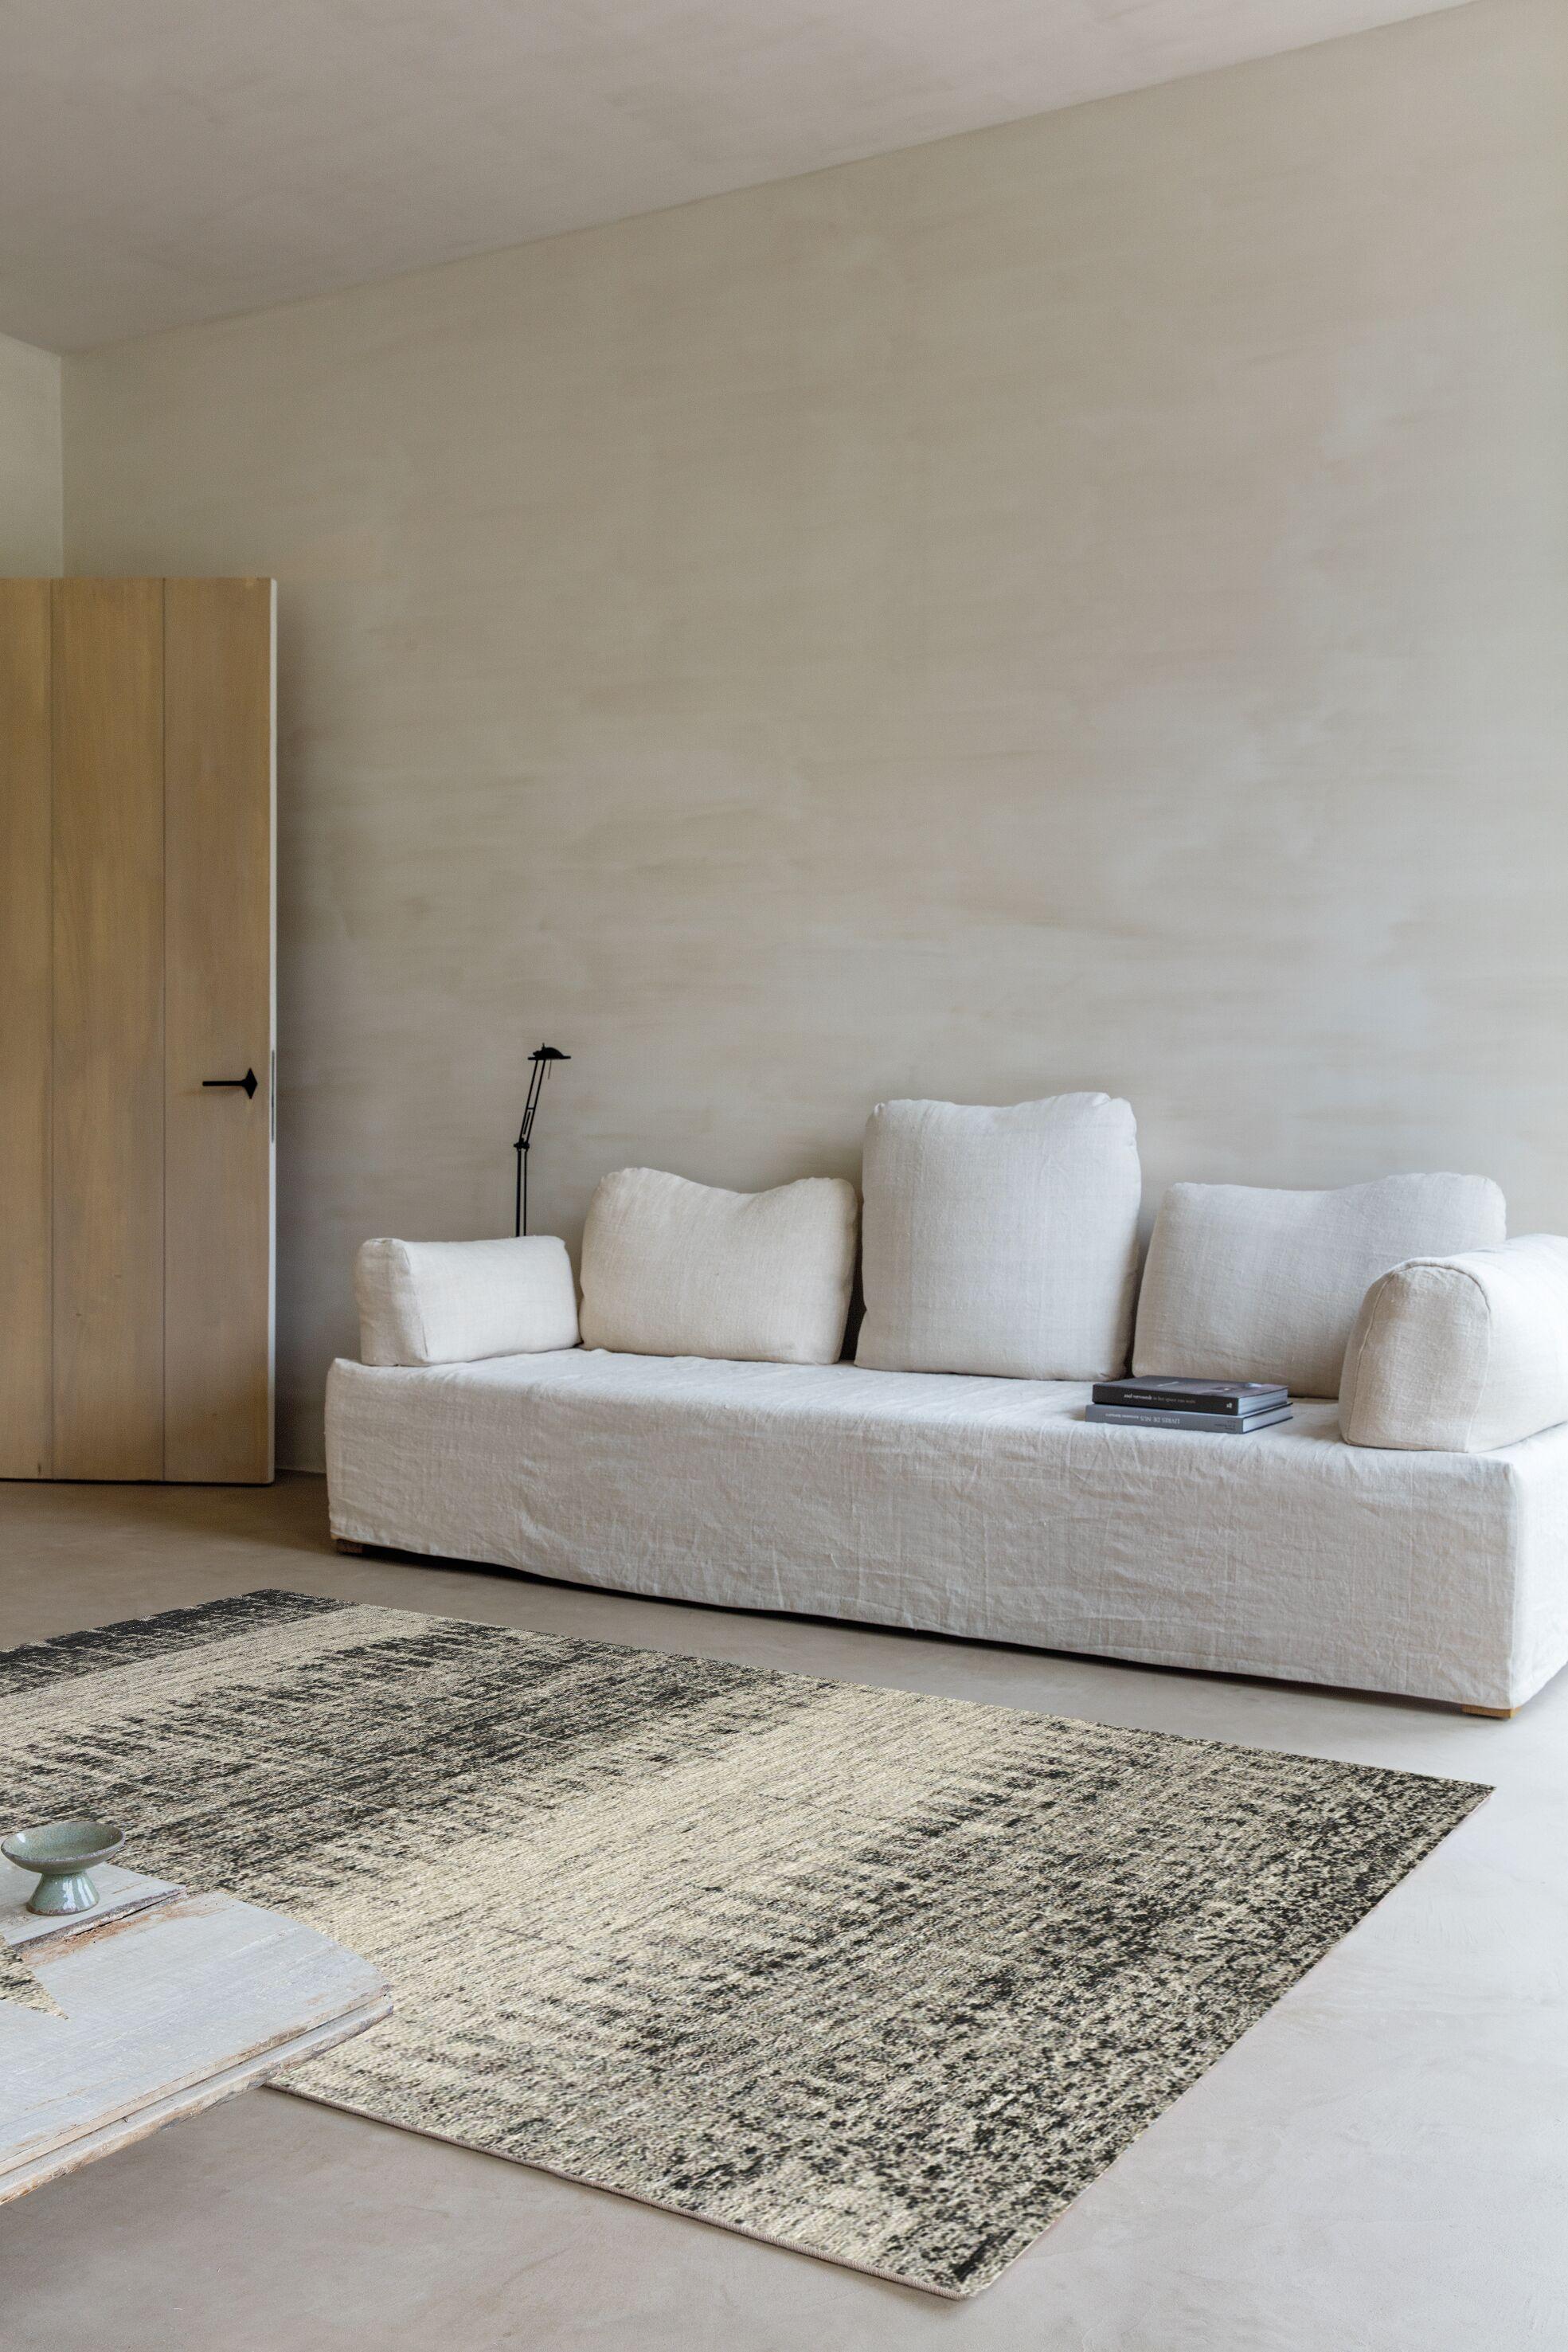 Roseau Grey Blurred Lines Rug Rug Size: 7'6